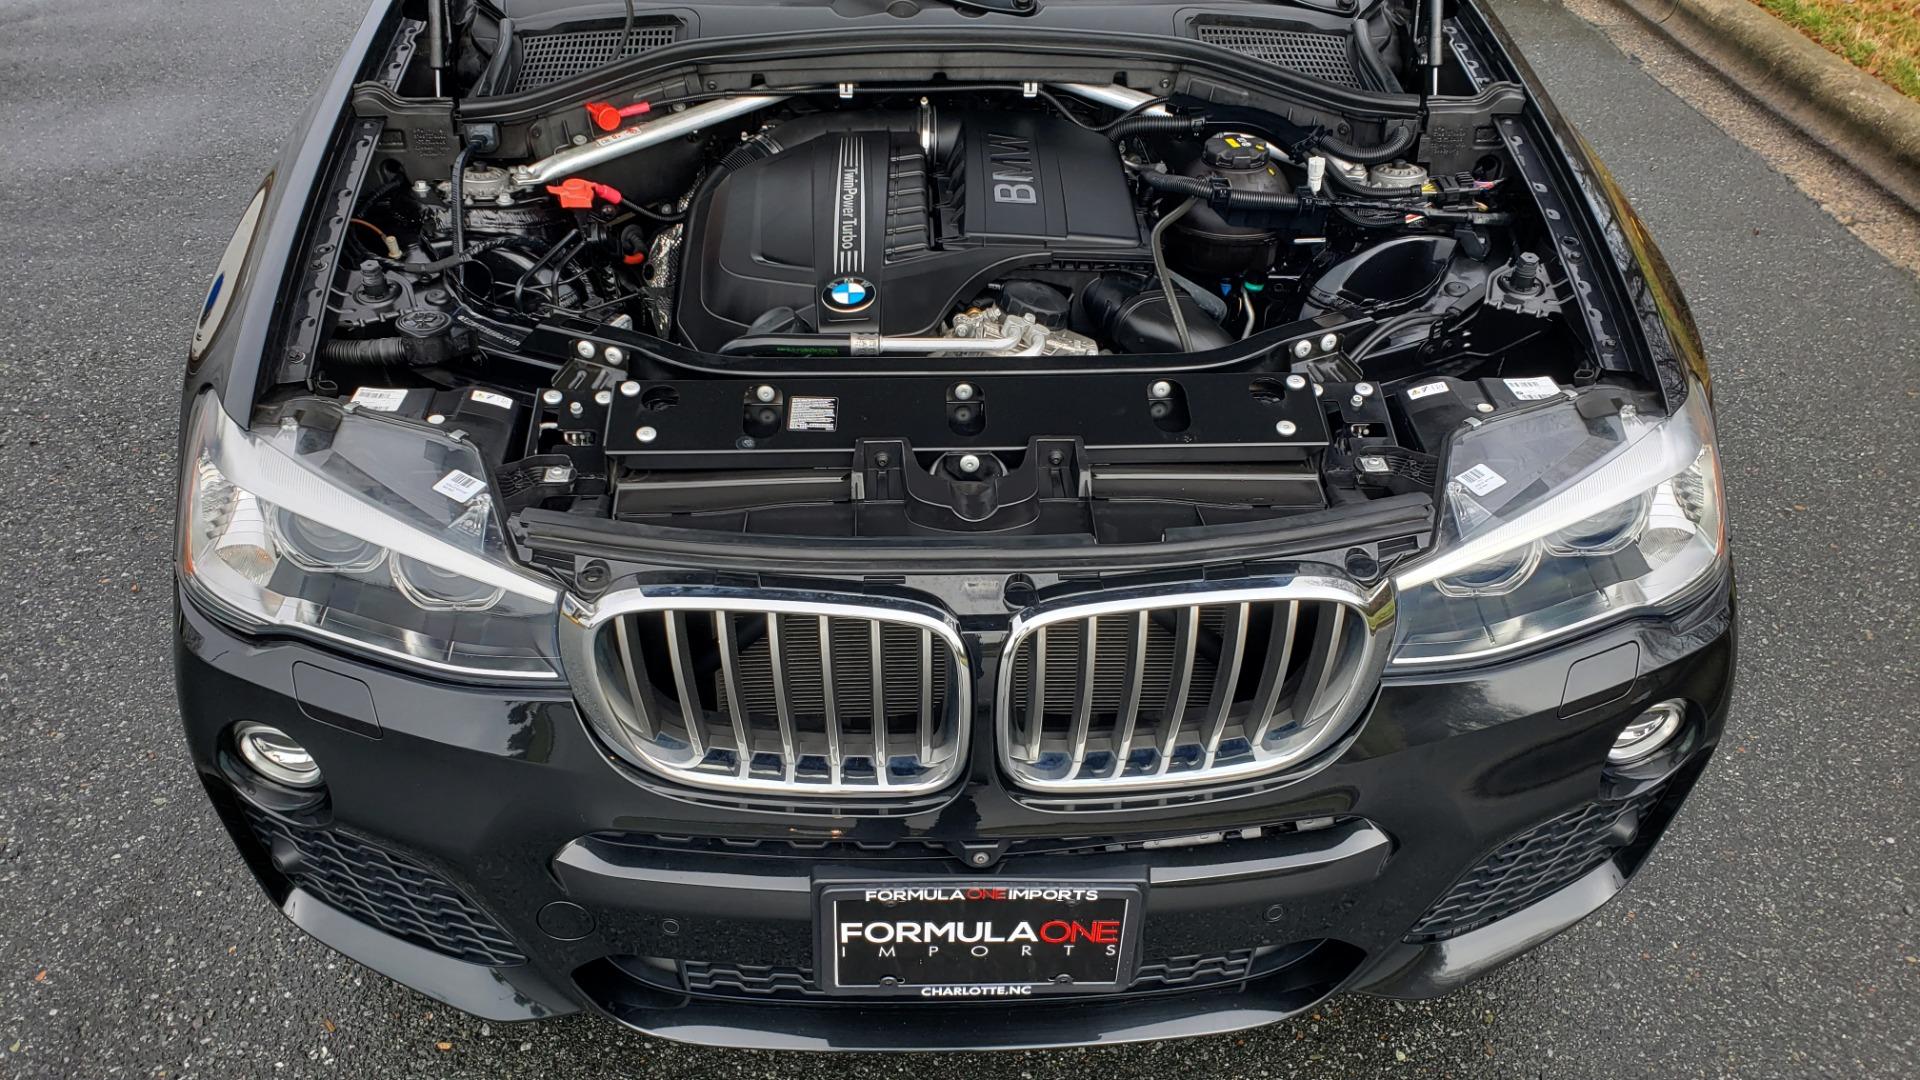 Used 2017 BMW X3 XDRIVE35I M-SPORT / DRVR ASST PLUS / TECHNOLOGY / HUD / BLIND SPOT for sale Sold at Formula Imports in Charlotte NC 28227 10